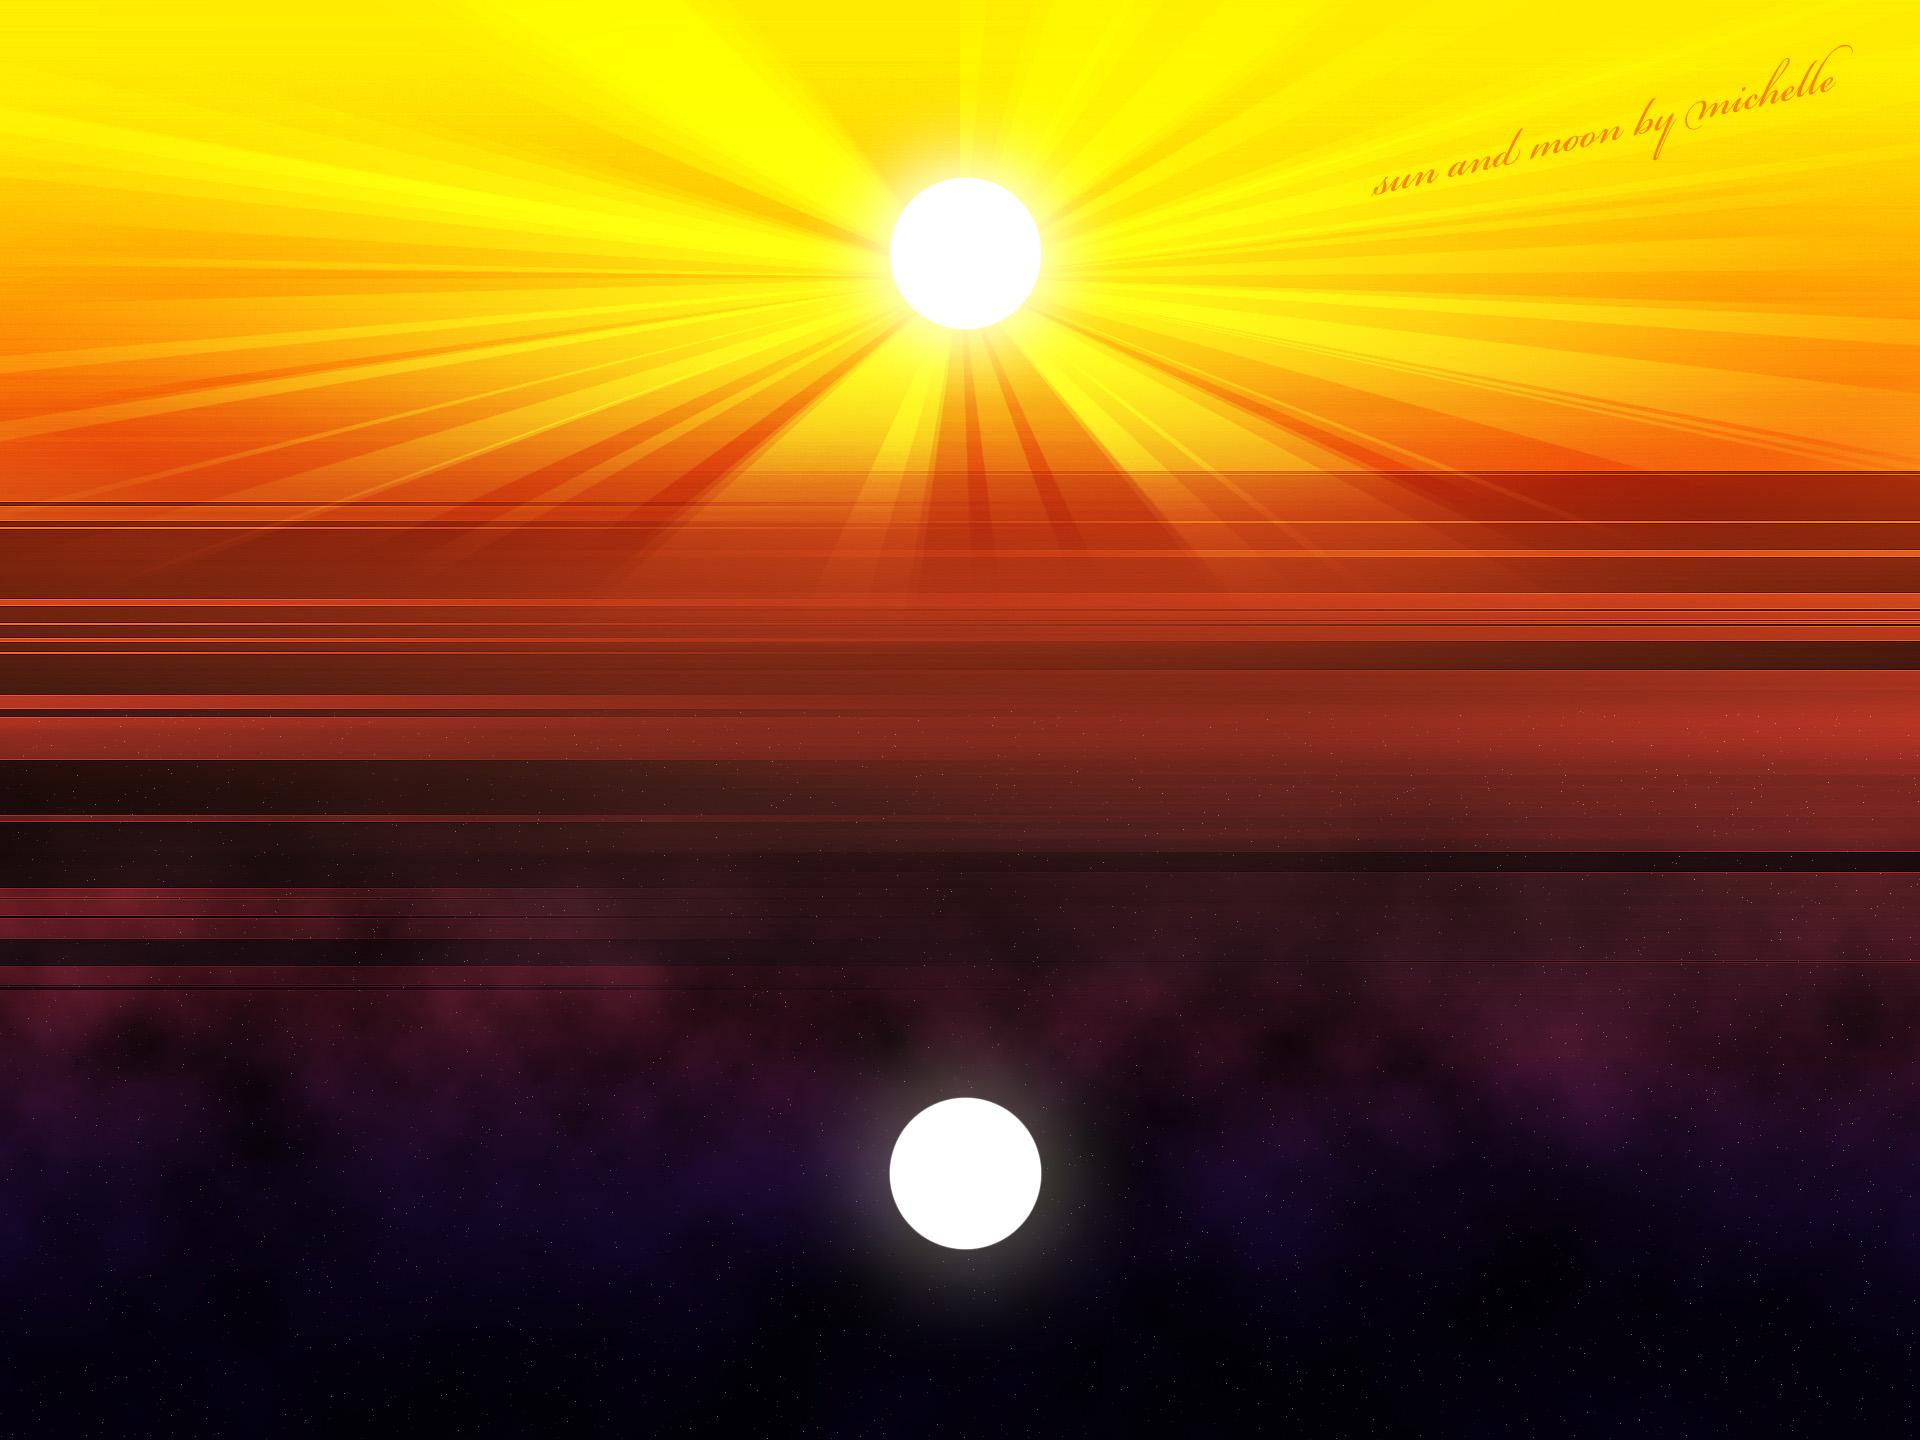 Sun And Moon Backgrounds - WallpaperSafari